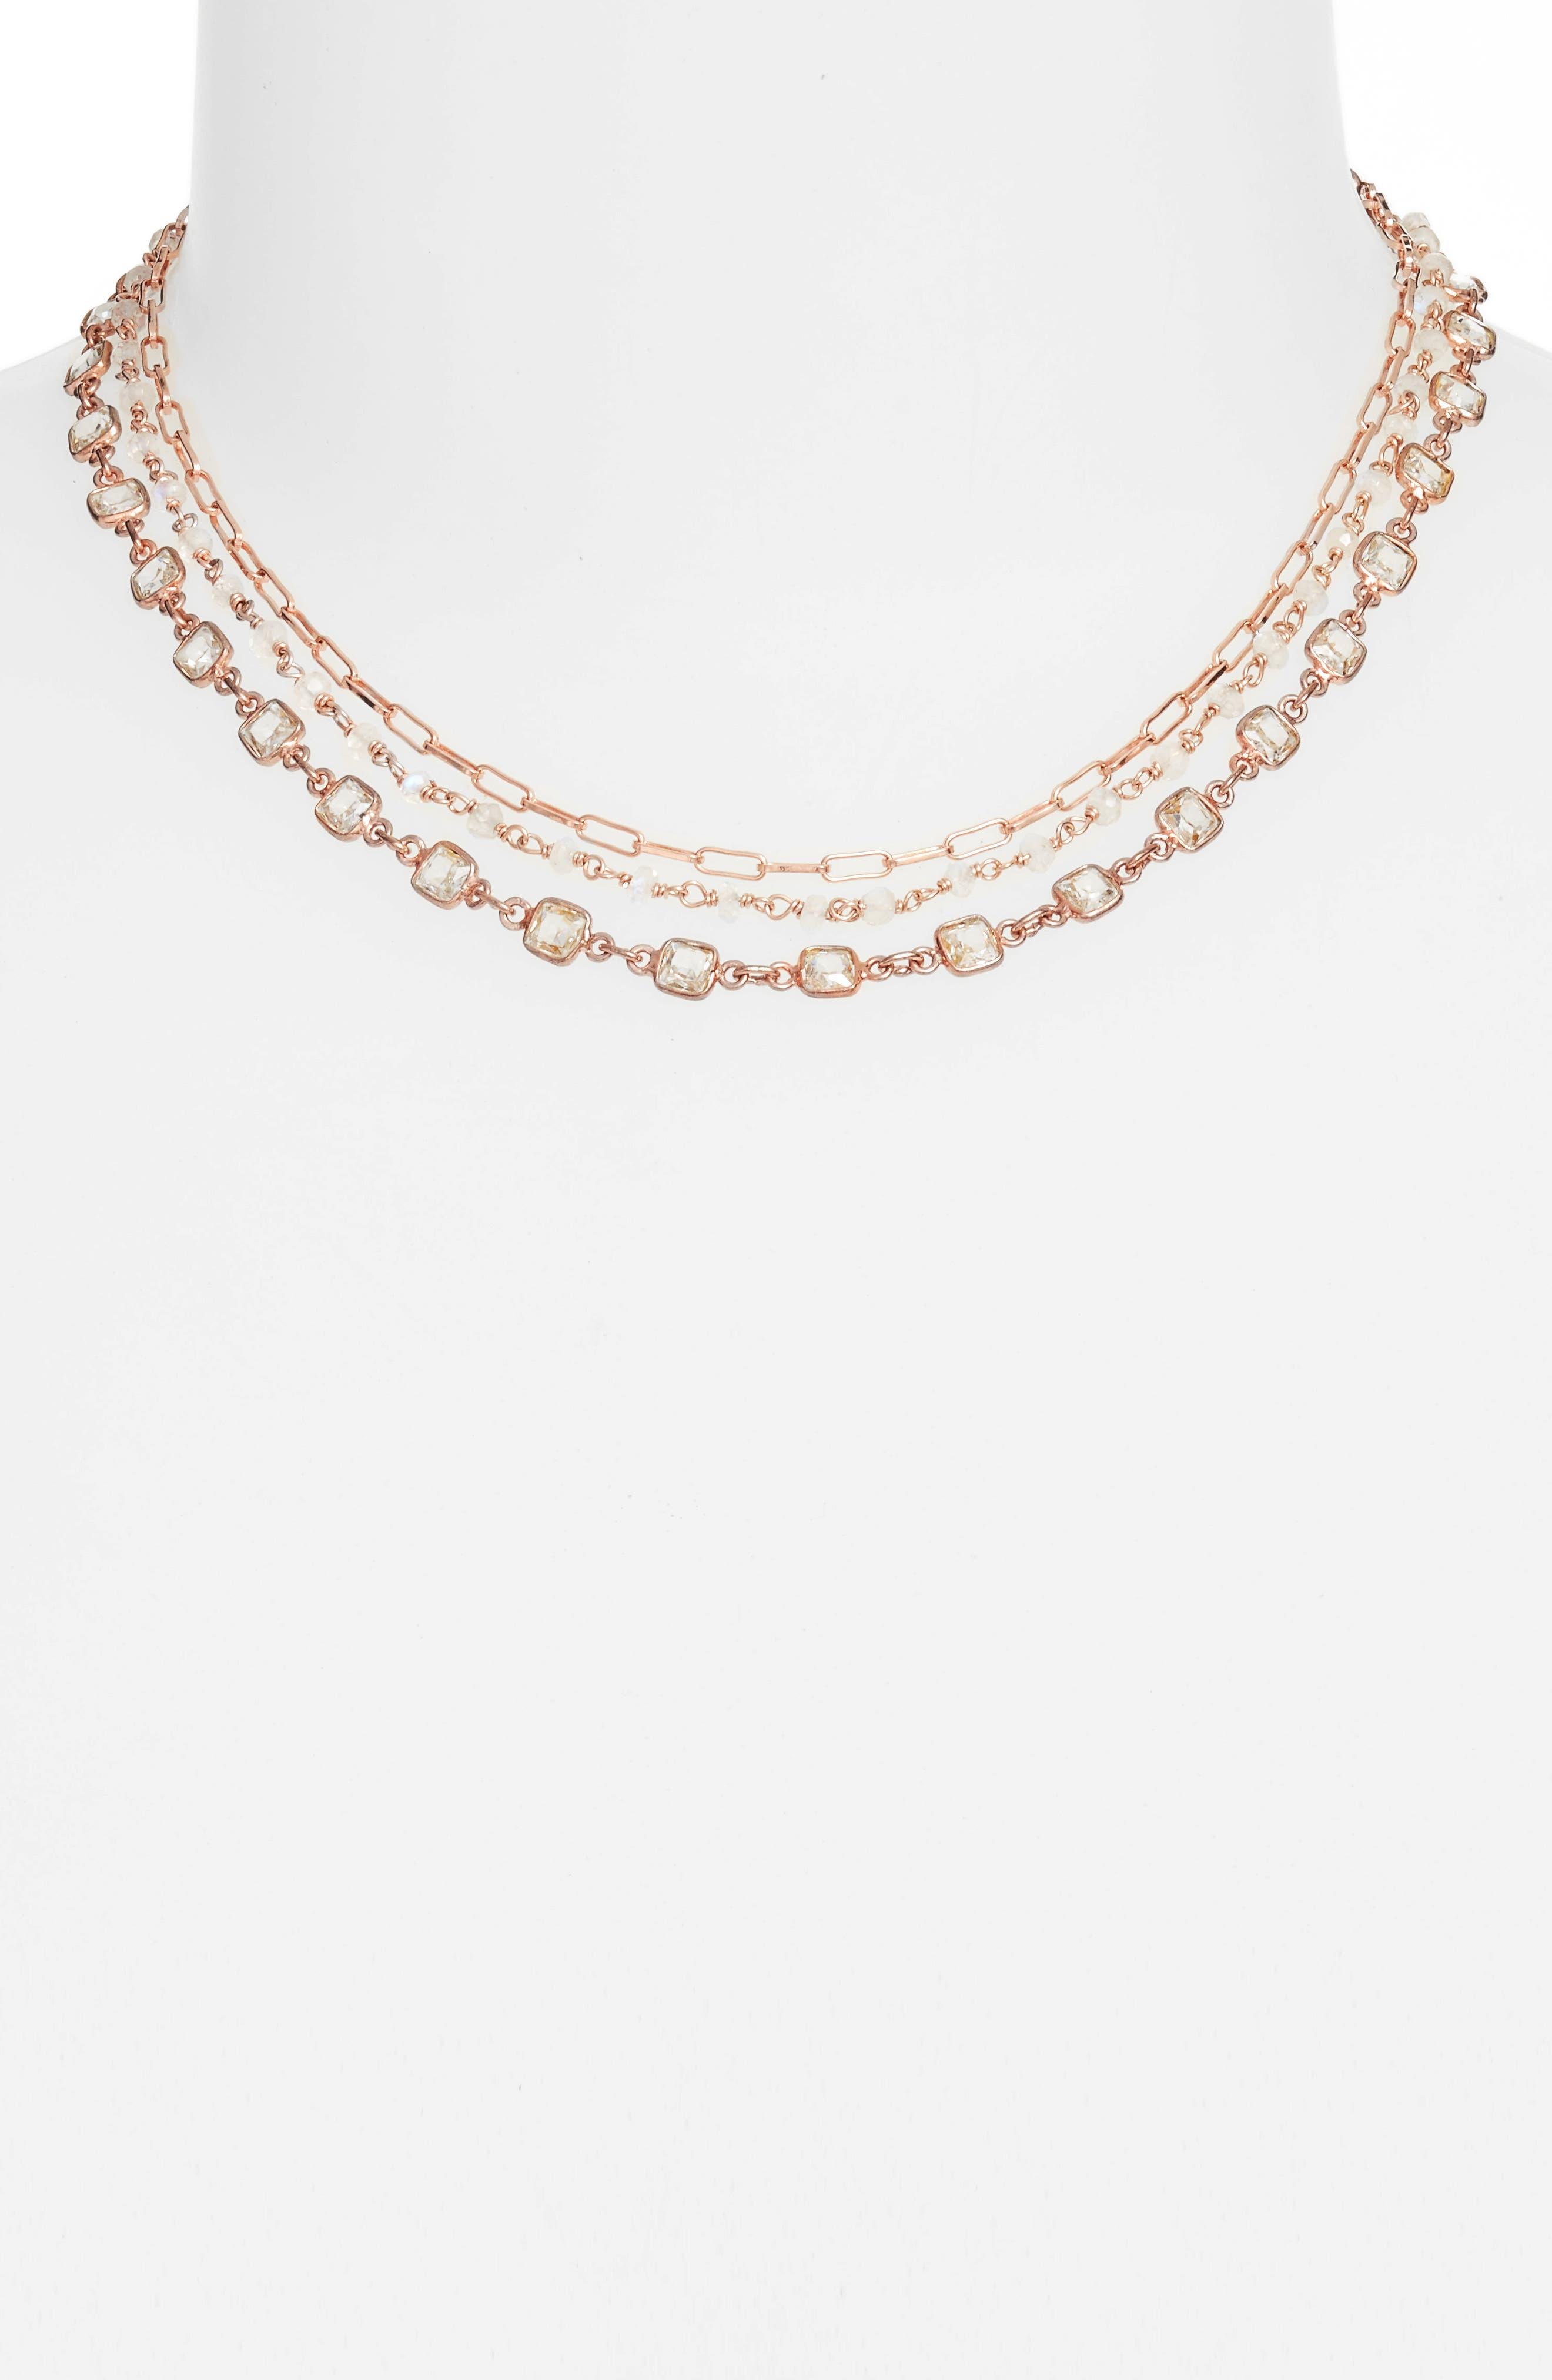 ela rae Multistrand Collar Necklace